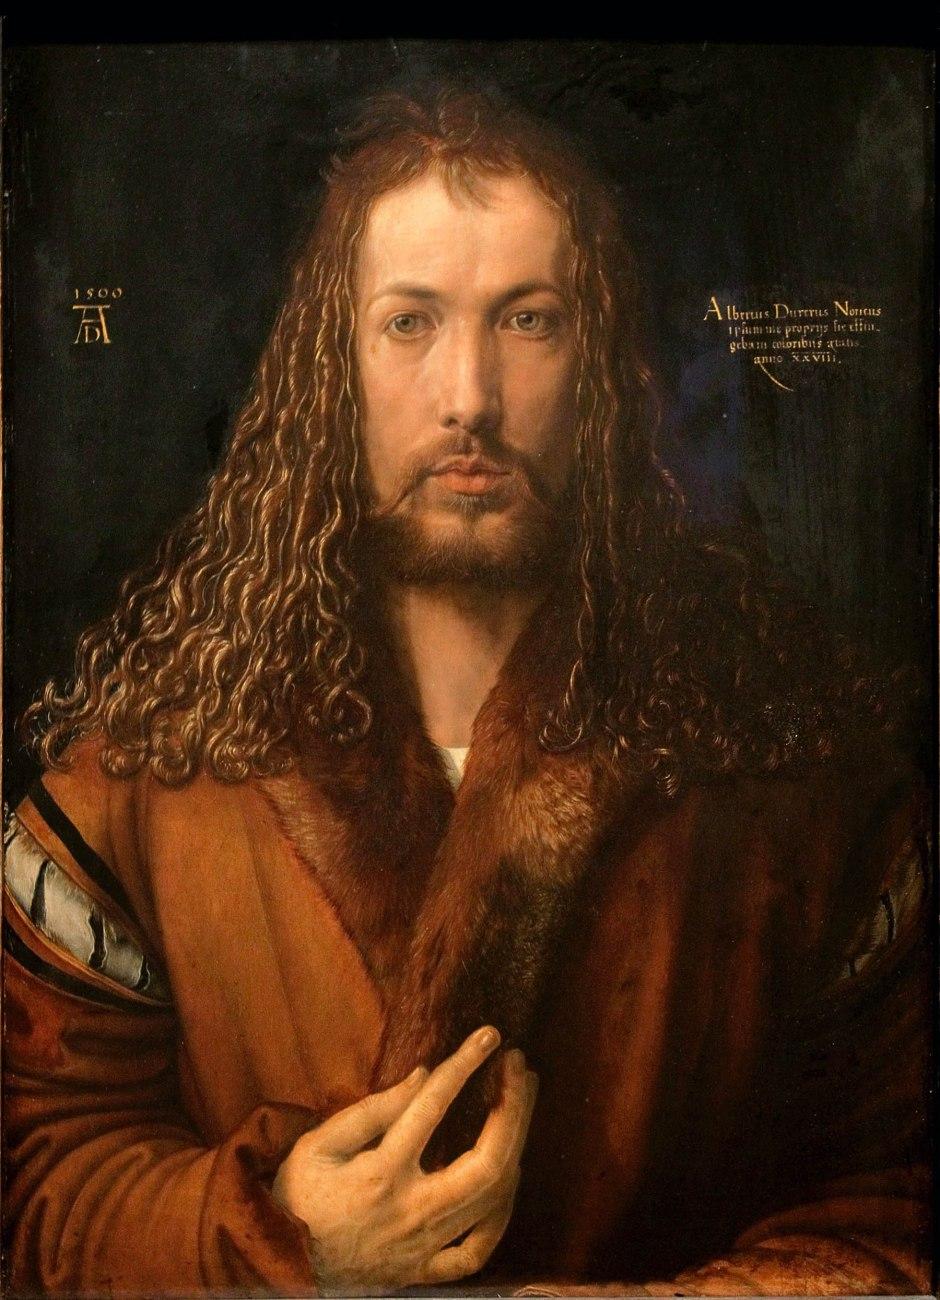 Albrecht Dürer, autoritratto con pelliccia, 1500